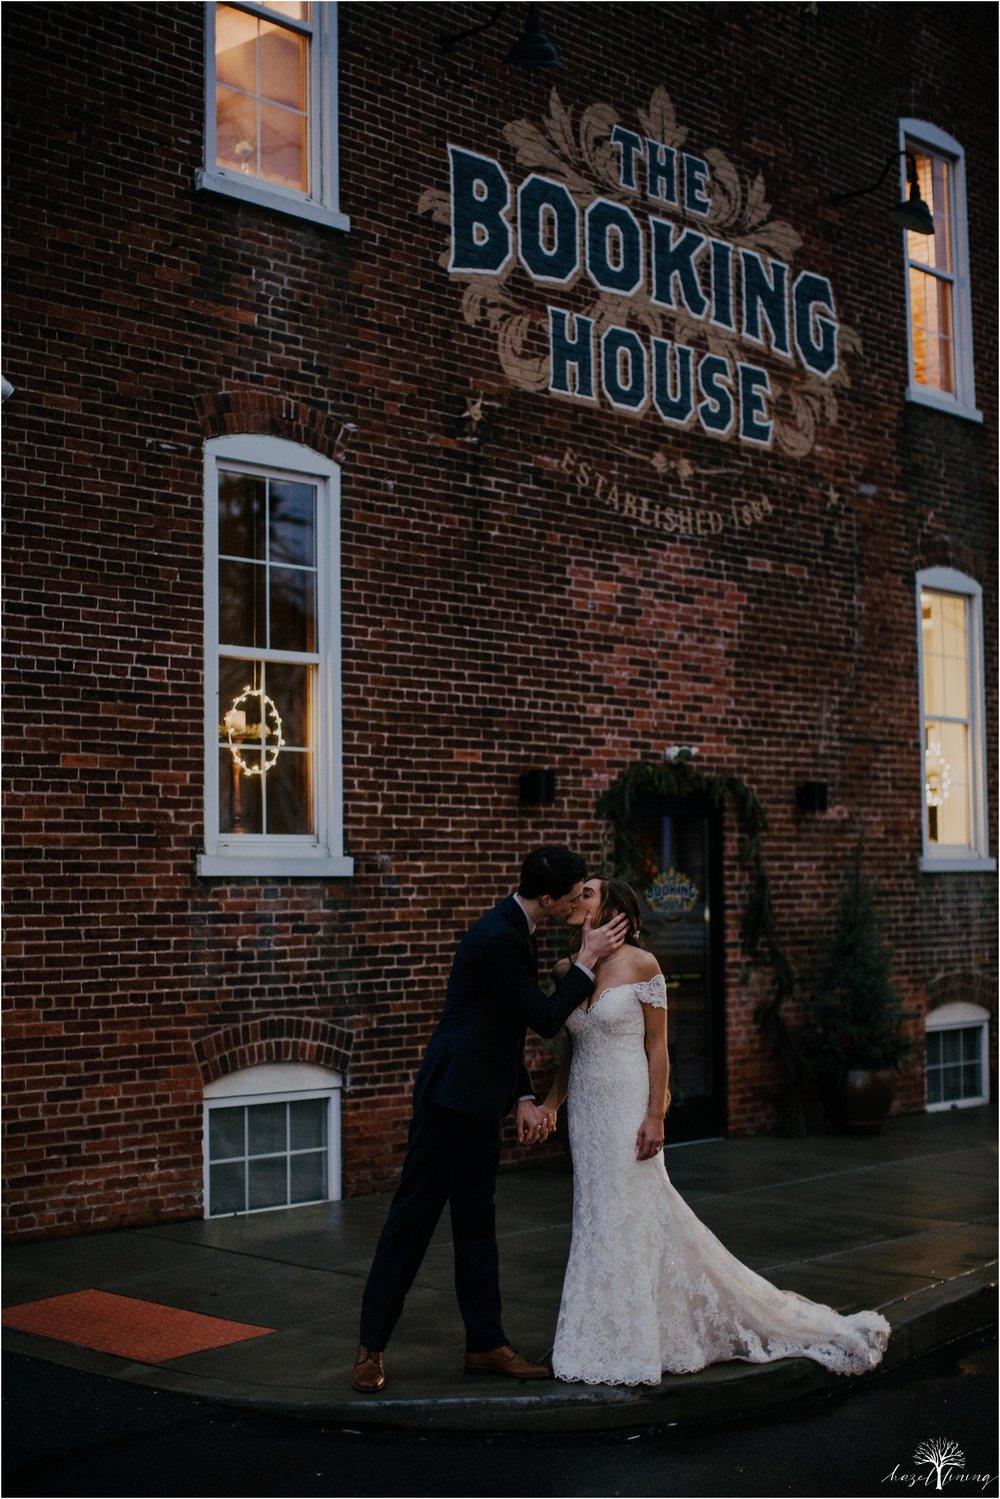 emma-matt-gehringer-the-booking-house-lancaster-manhiem-pennsylvania-winter-wedding_0198.jpg